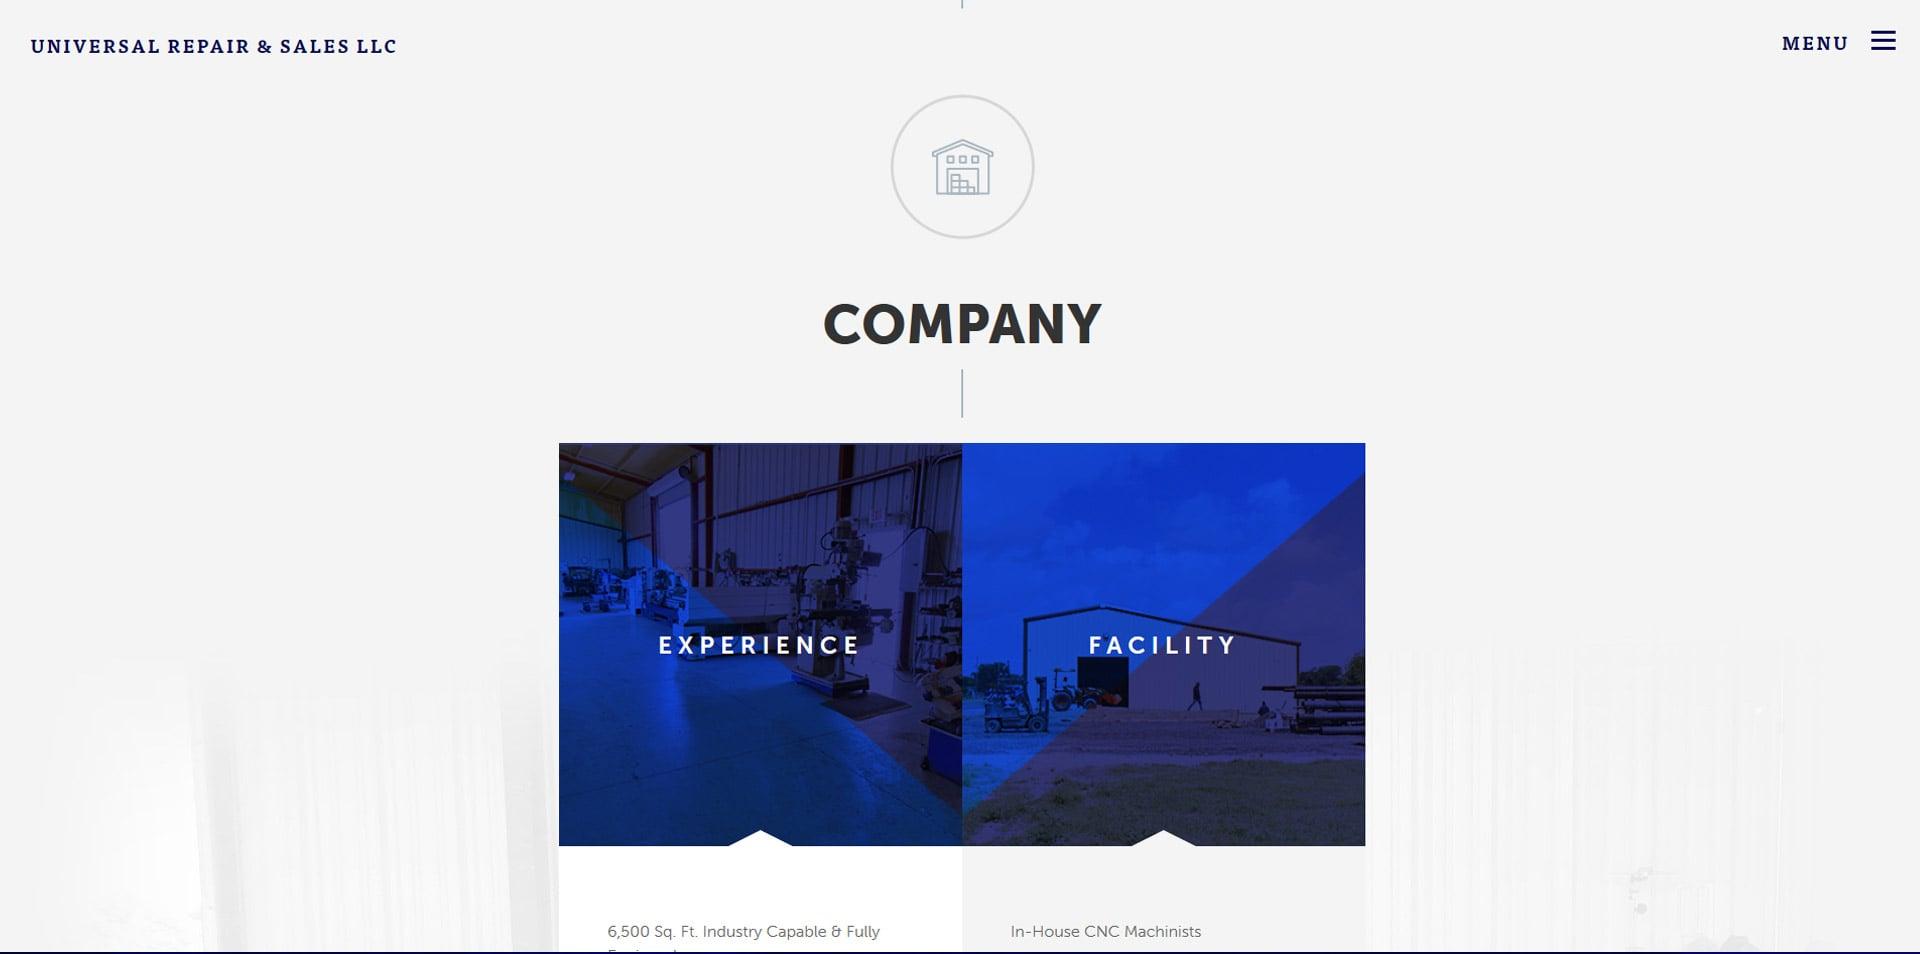 projektowanie-stron-www-inspiracje-universalrepairandsales-2